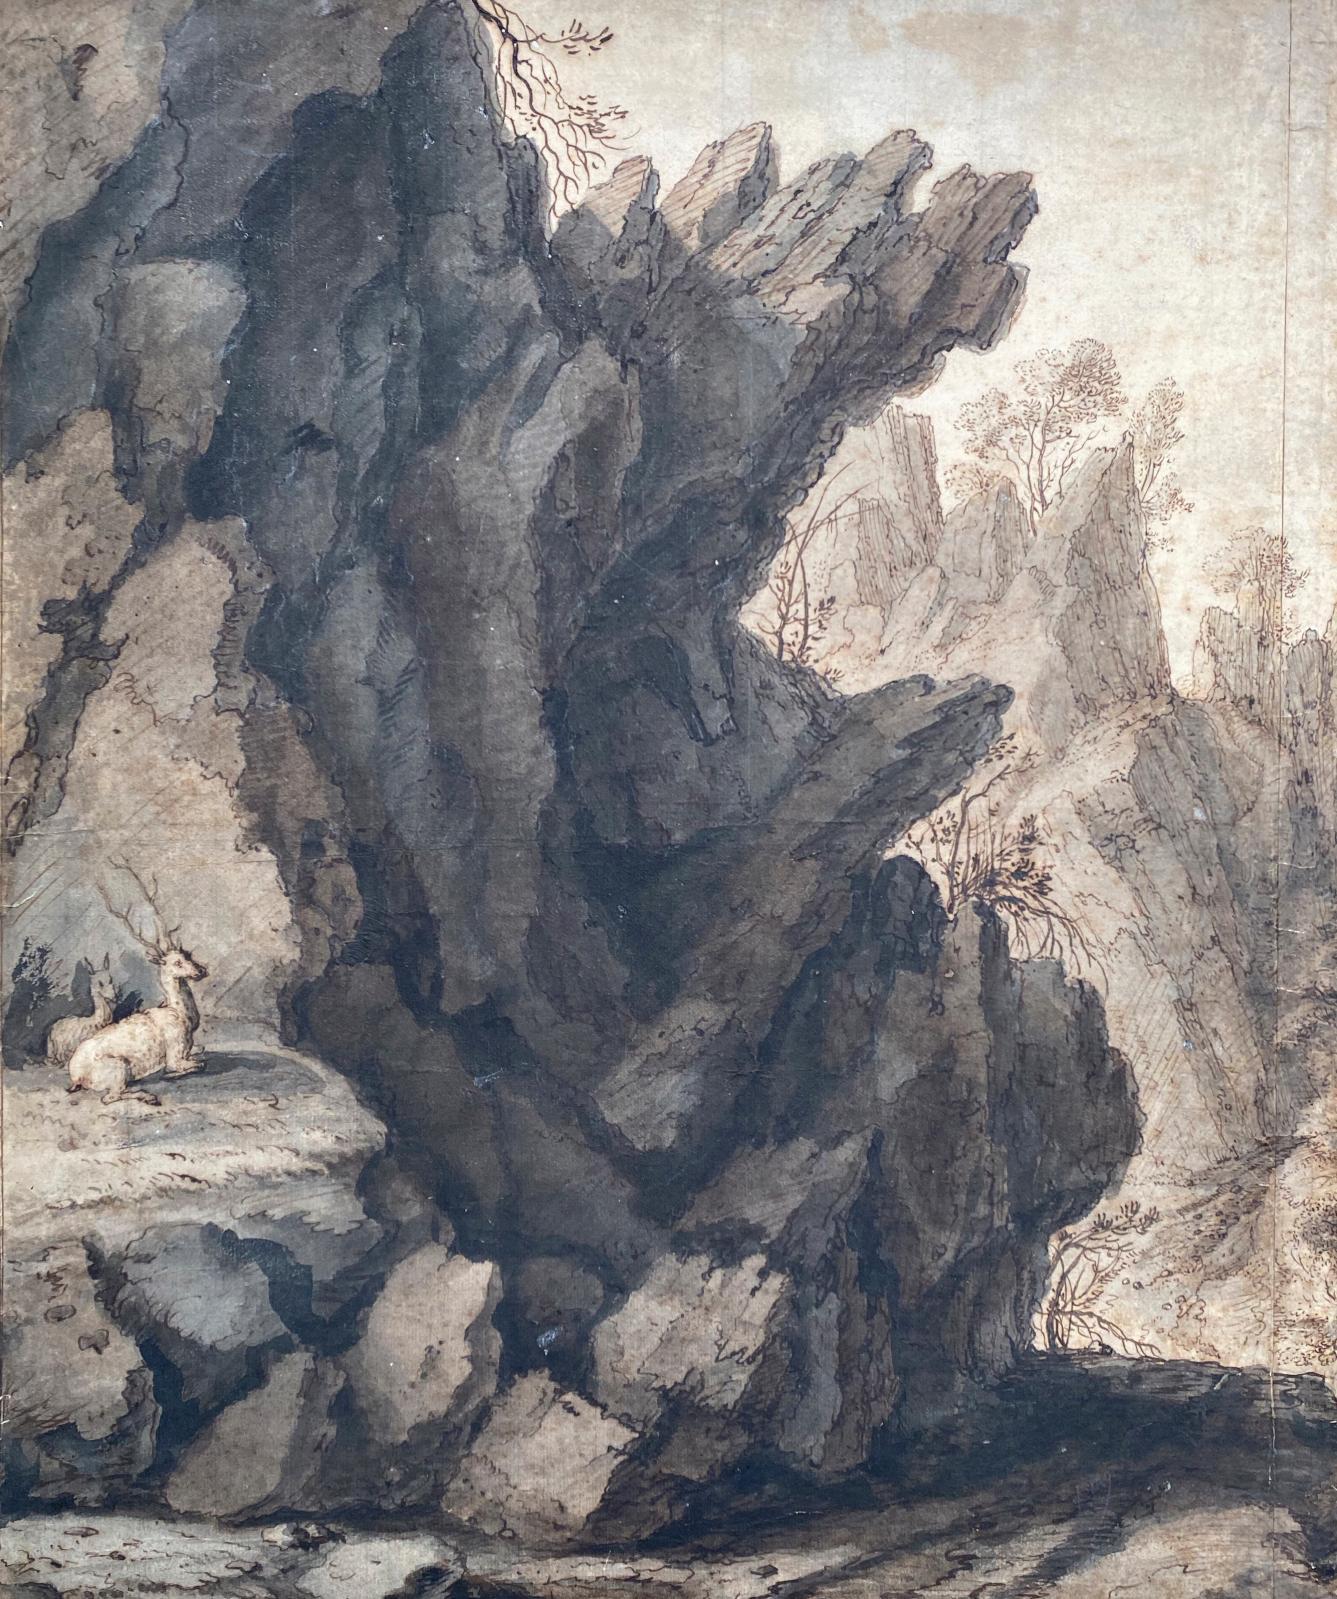 Lambert Doomer (1624-1700), Paysage de montagne, plume et encre brune, lavis brun et gris, 44x37cm. Galerie Benjamin Peronnet. © Benjam